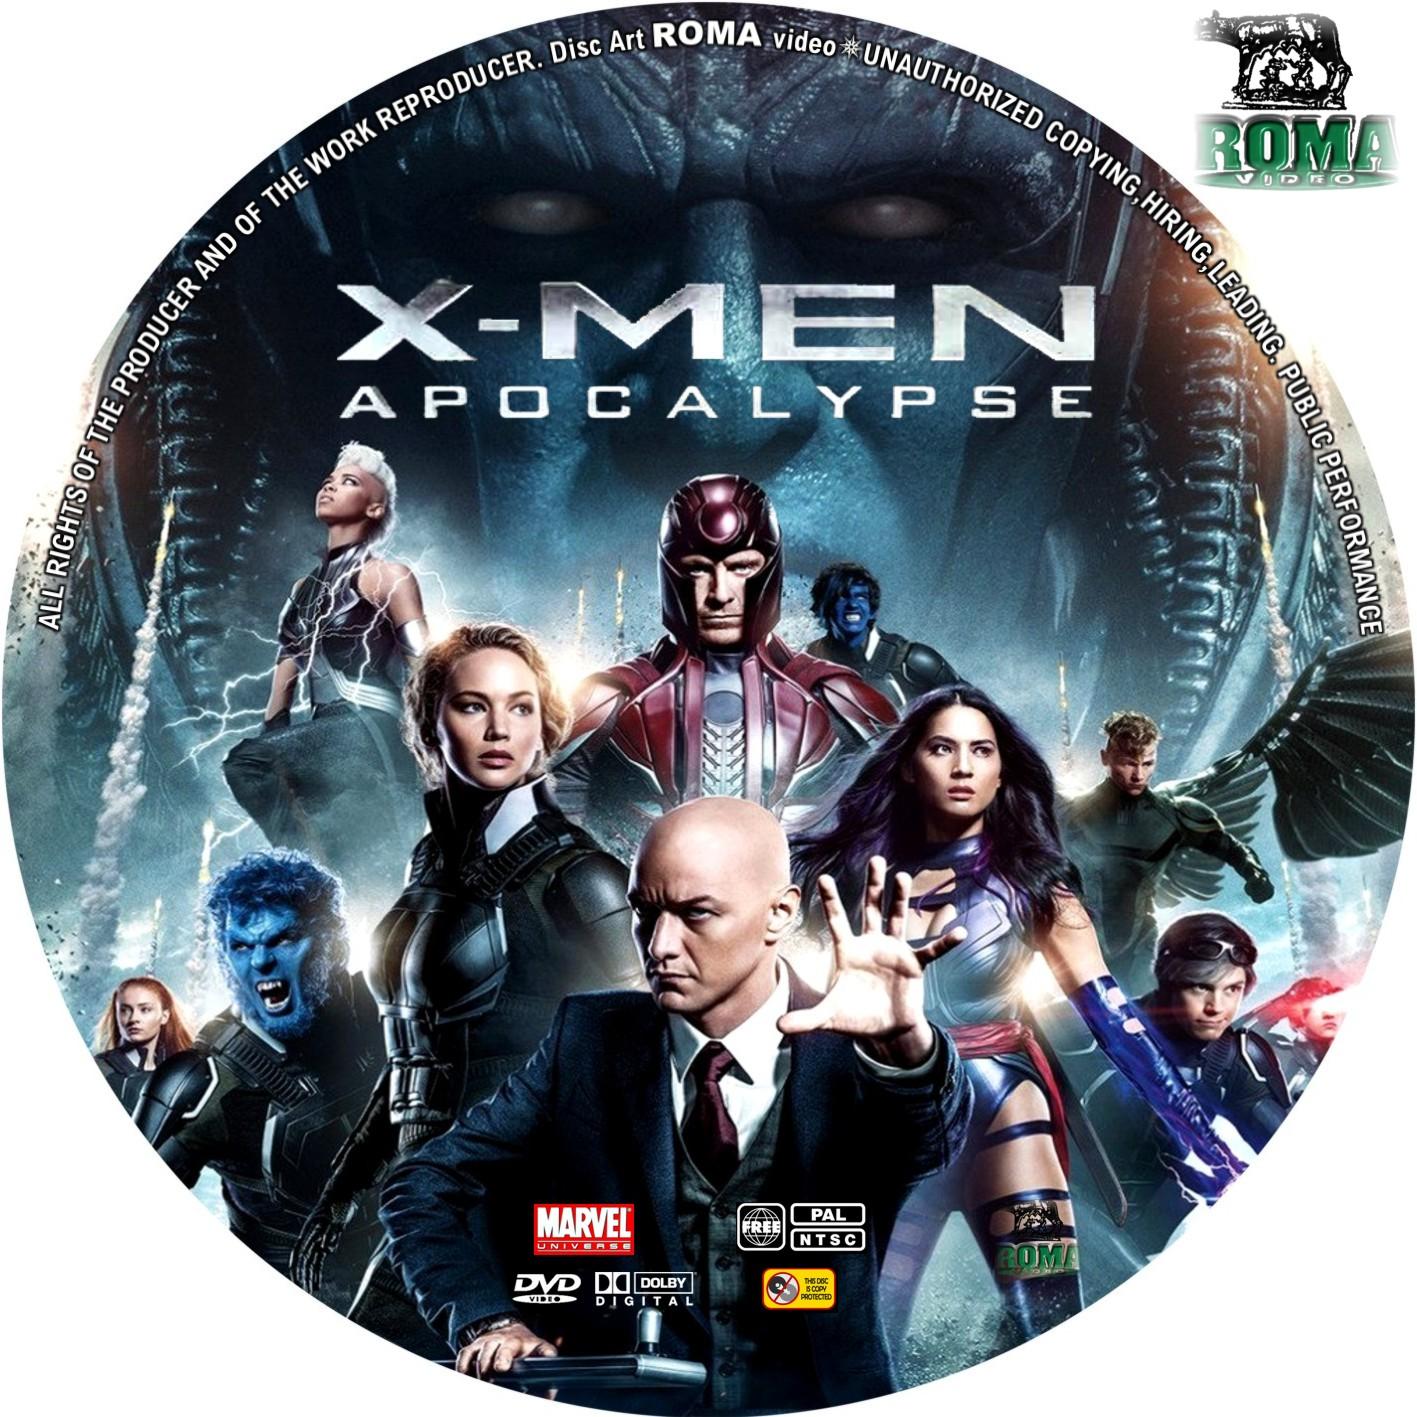 coversboxsk x men apocalypse 2016 high quality